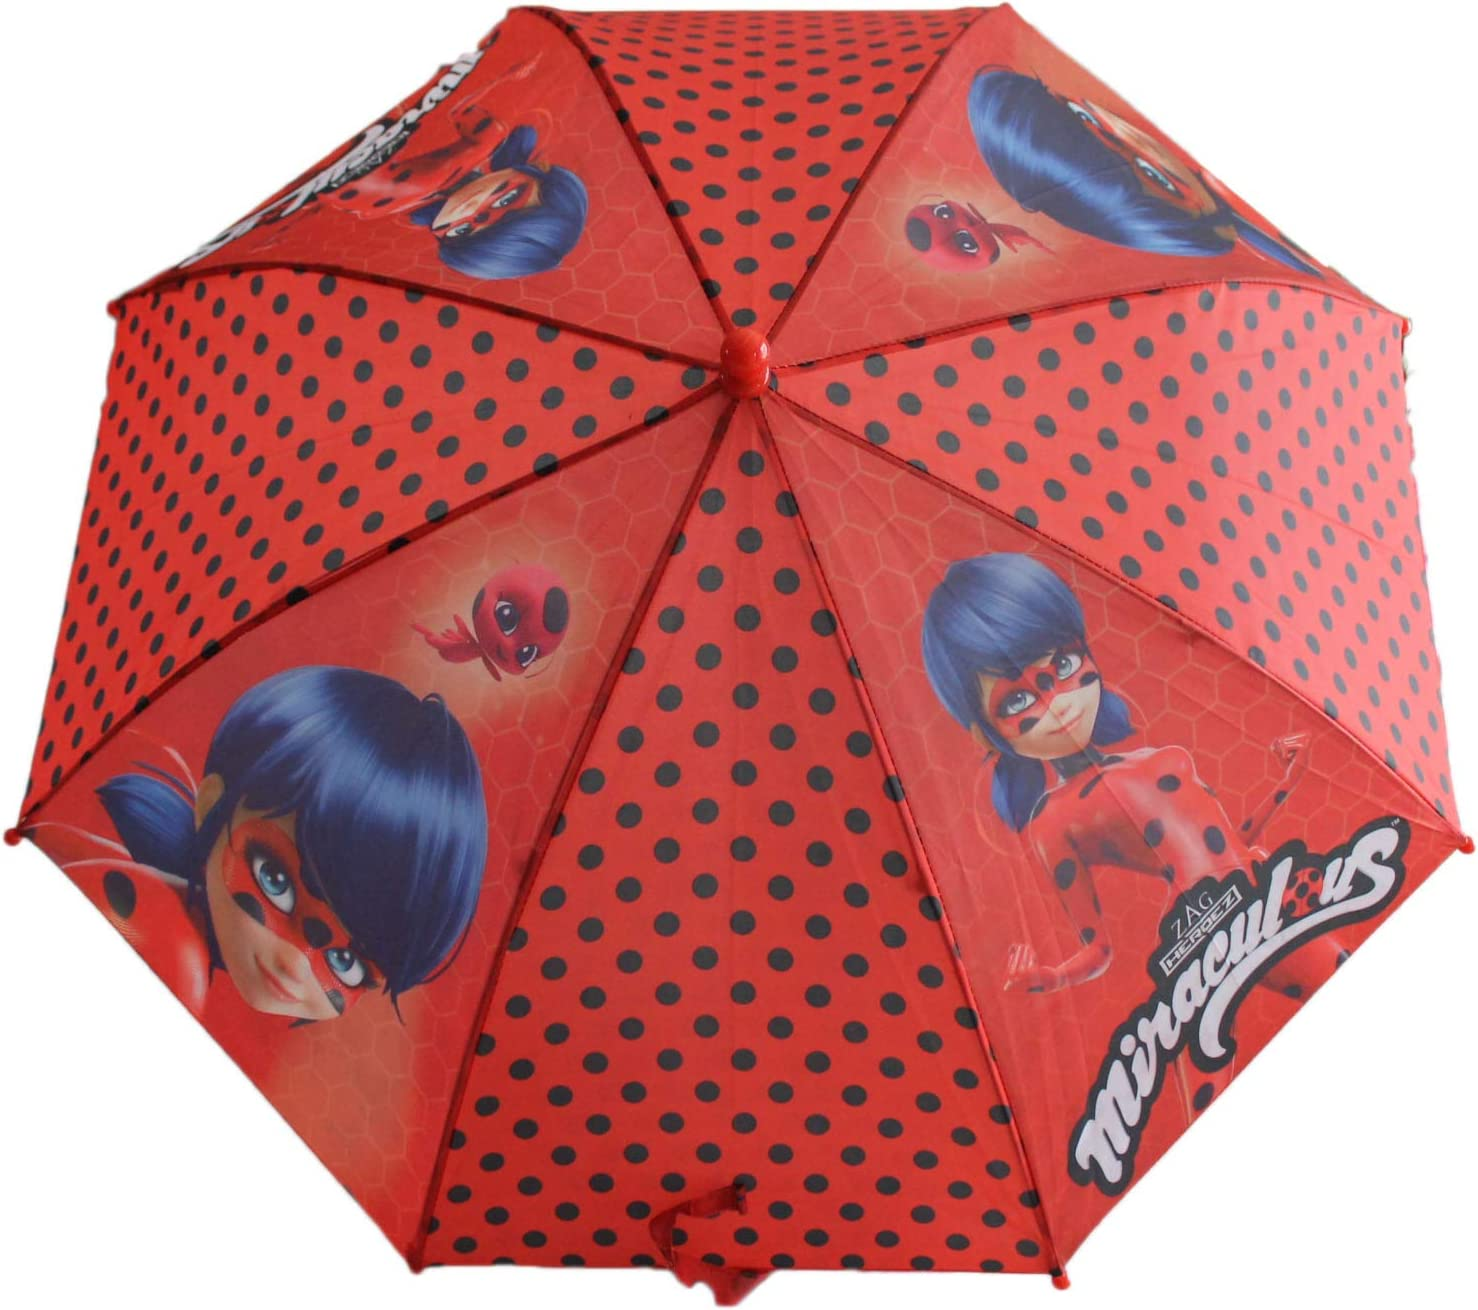 Disney–Ladybug Paraguas Manual, lb17039, 16